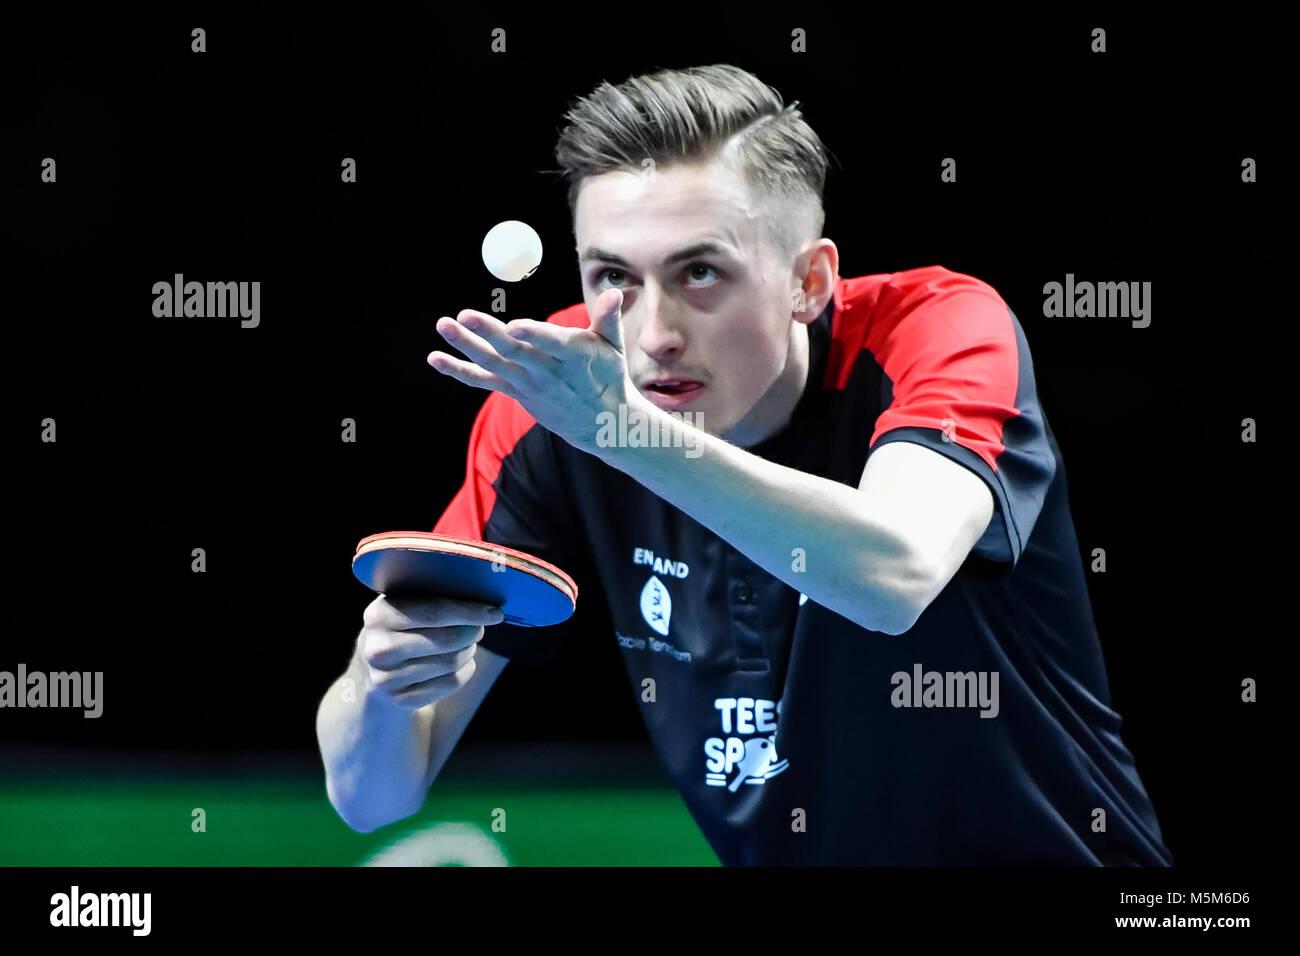 Londra, UK, 24 feb 2018. Lian Pitchford di Inghilterra durante la International Table Tennis Federation World Team Immagini Stock